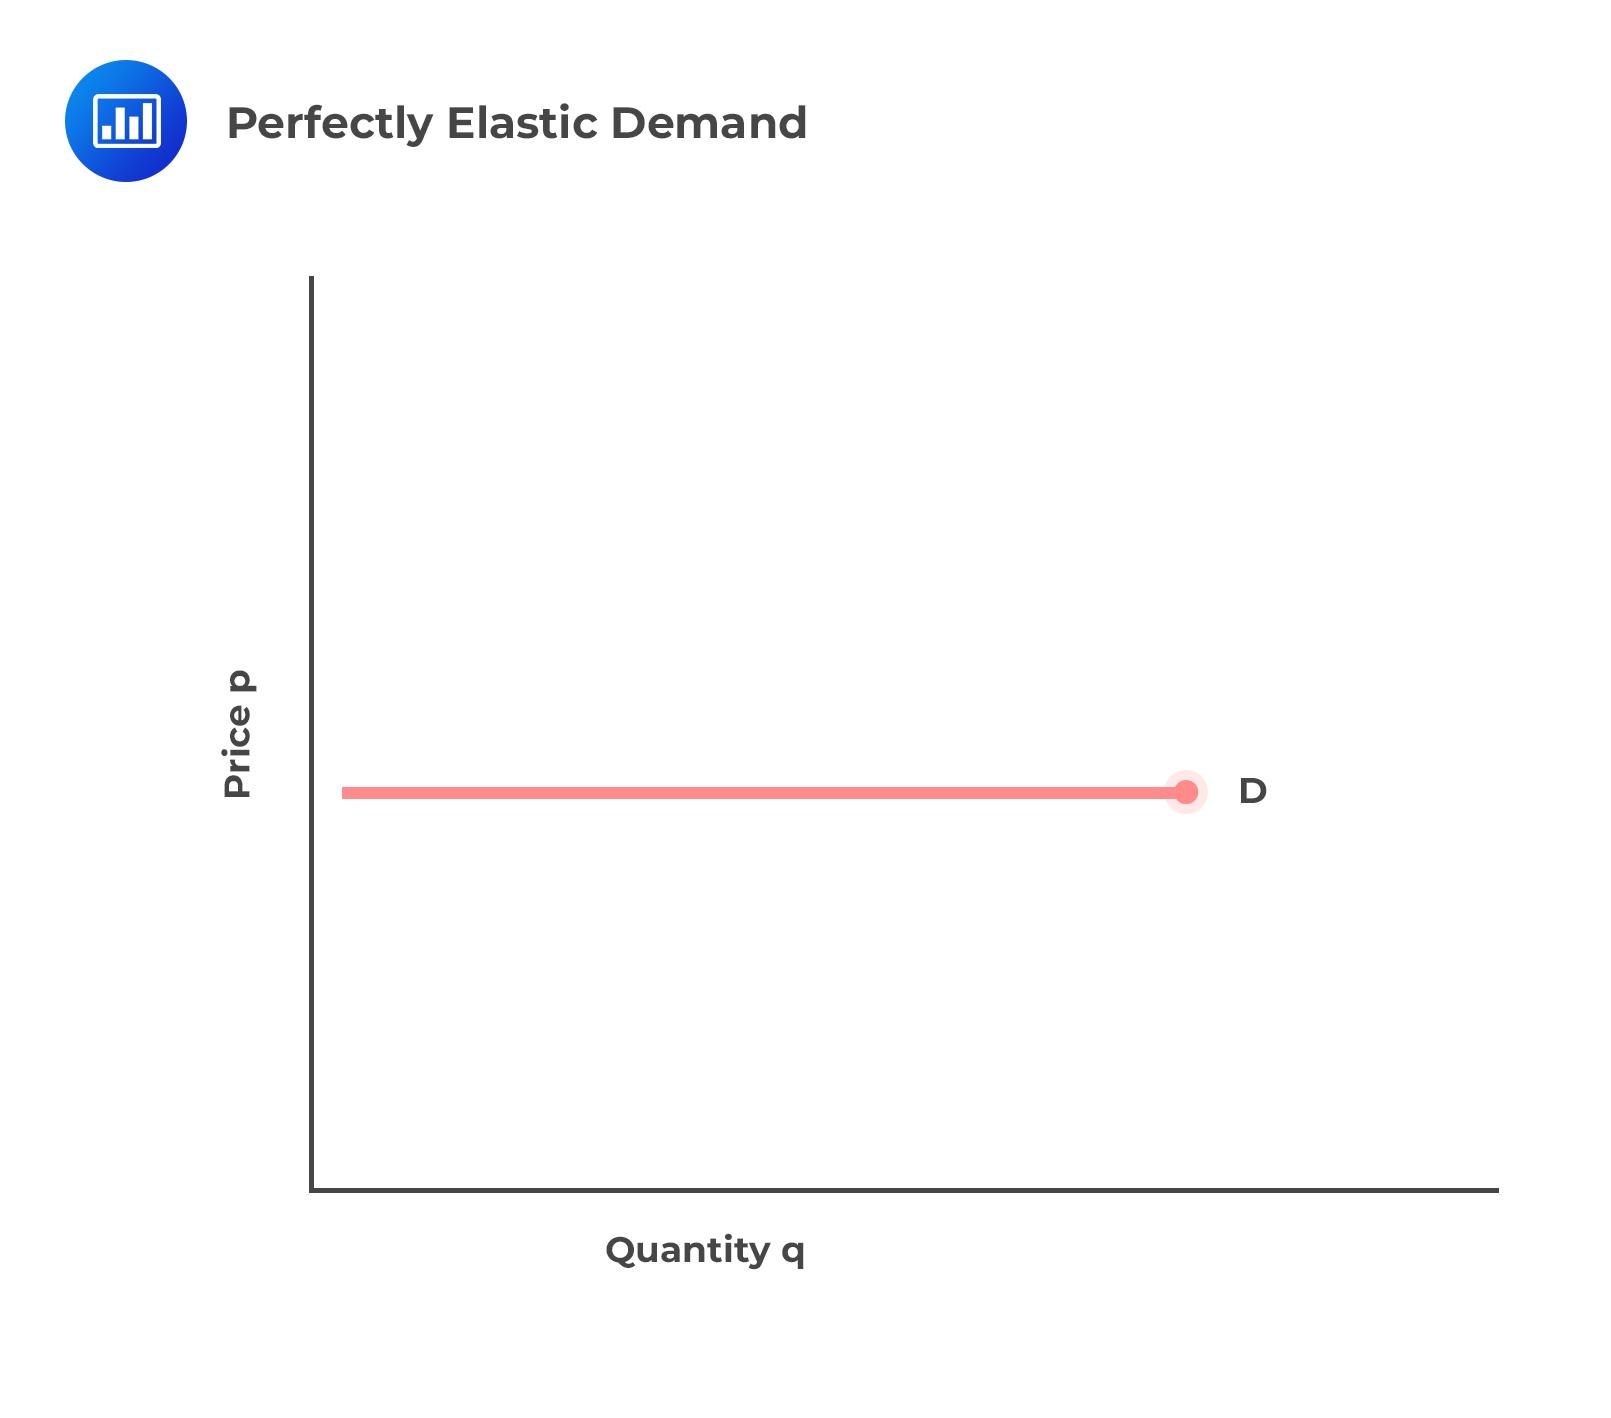 perfectly-elastic-demand